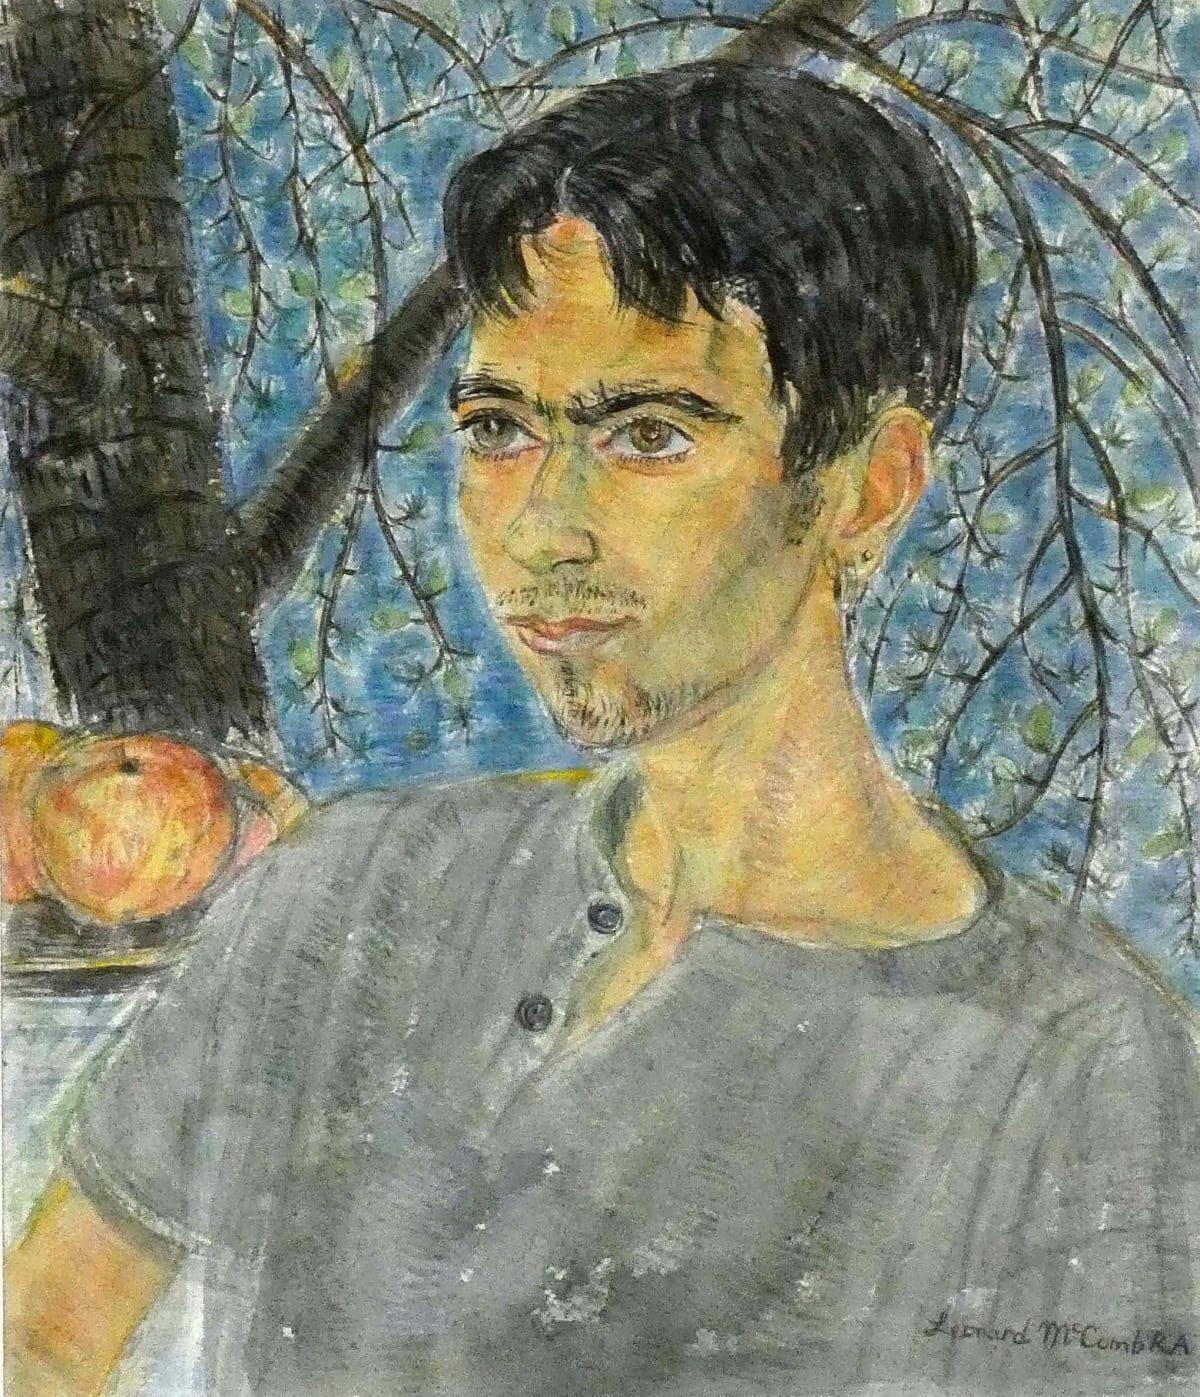 Leonard McComb, Portrait of Leonardo Ceraglio, 1997